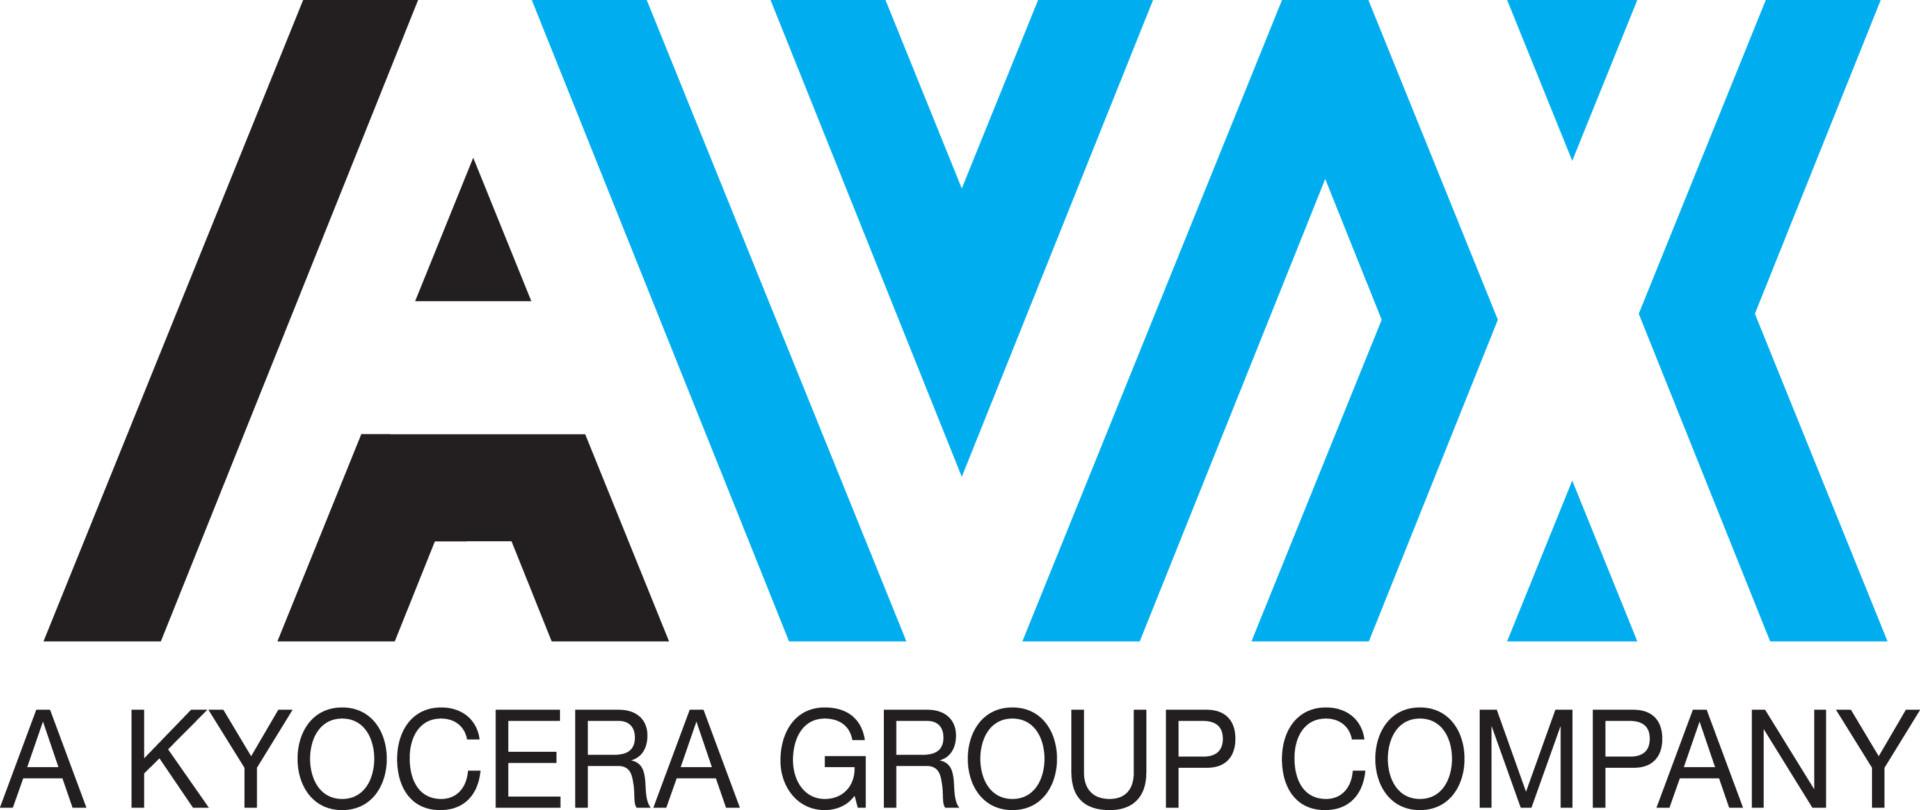 avx-corporate-logo-2015